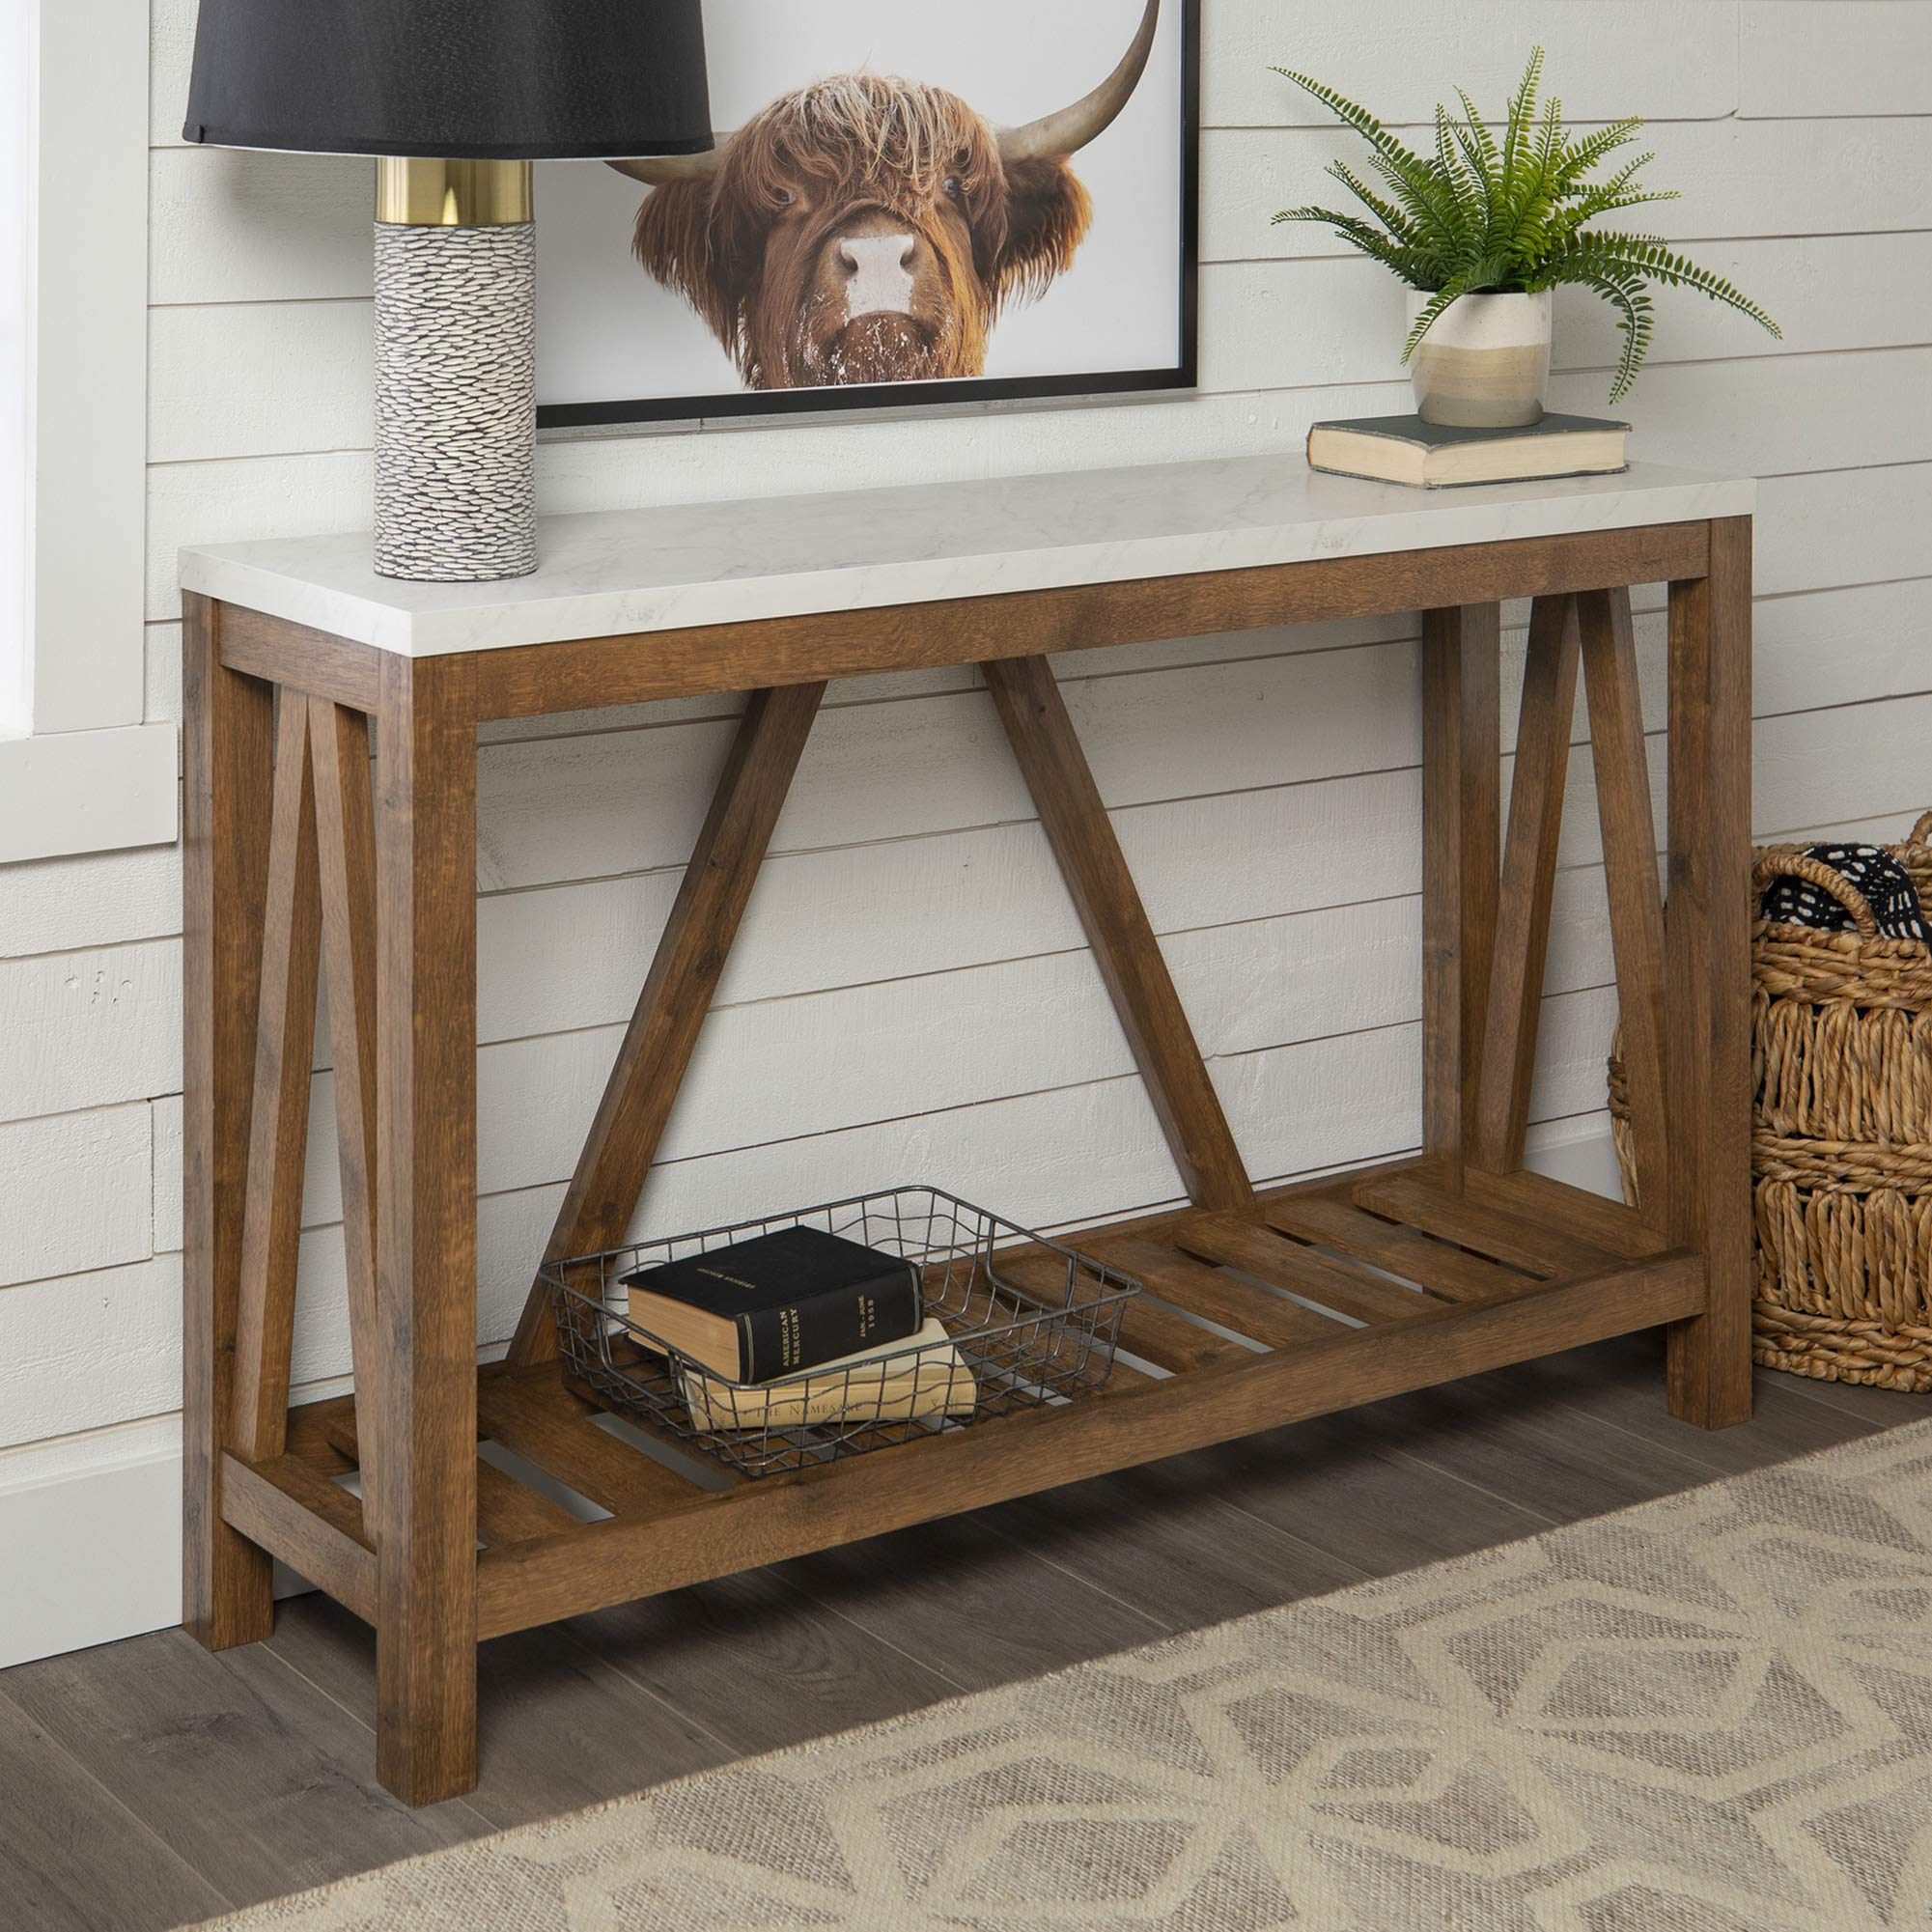 - Walker Edison Furniture Company Modern Farmhouse Entryway Accent